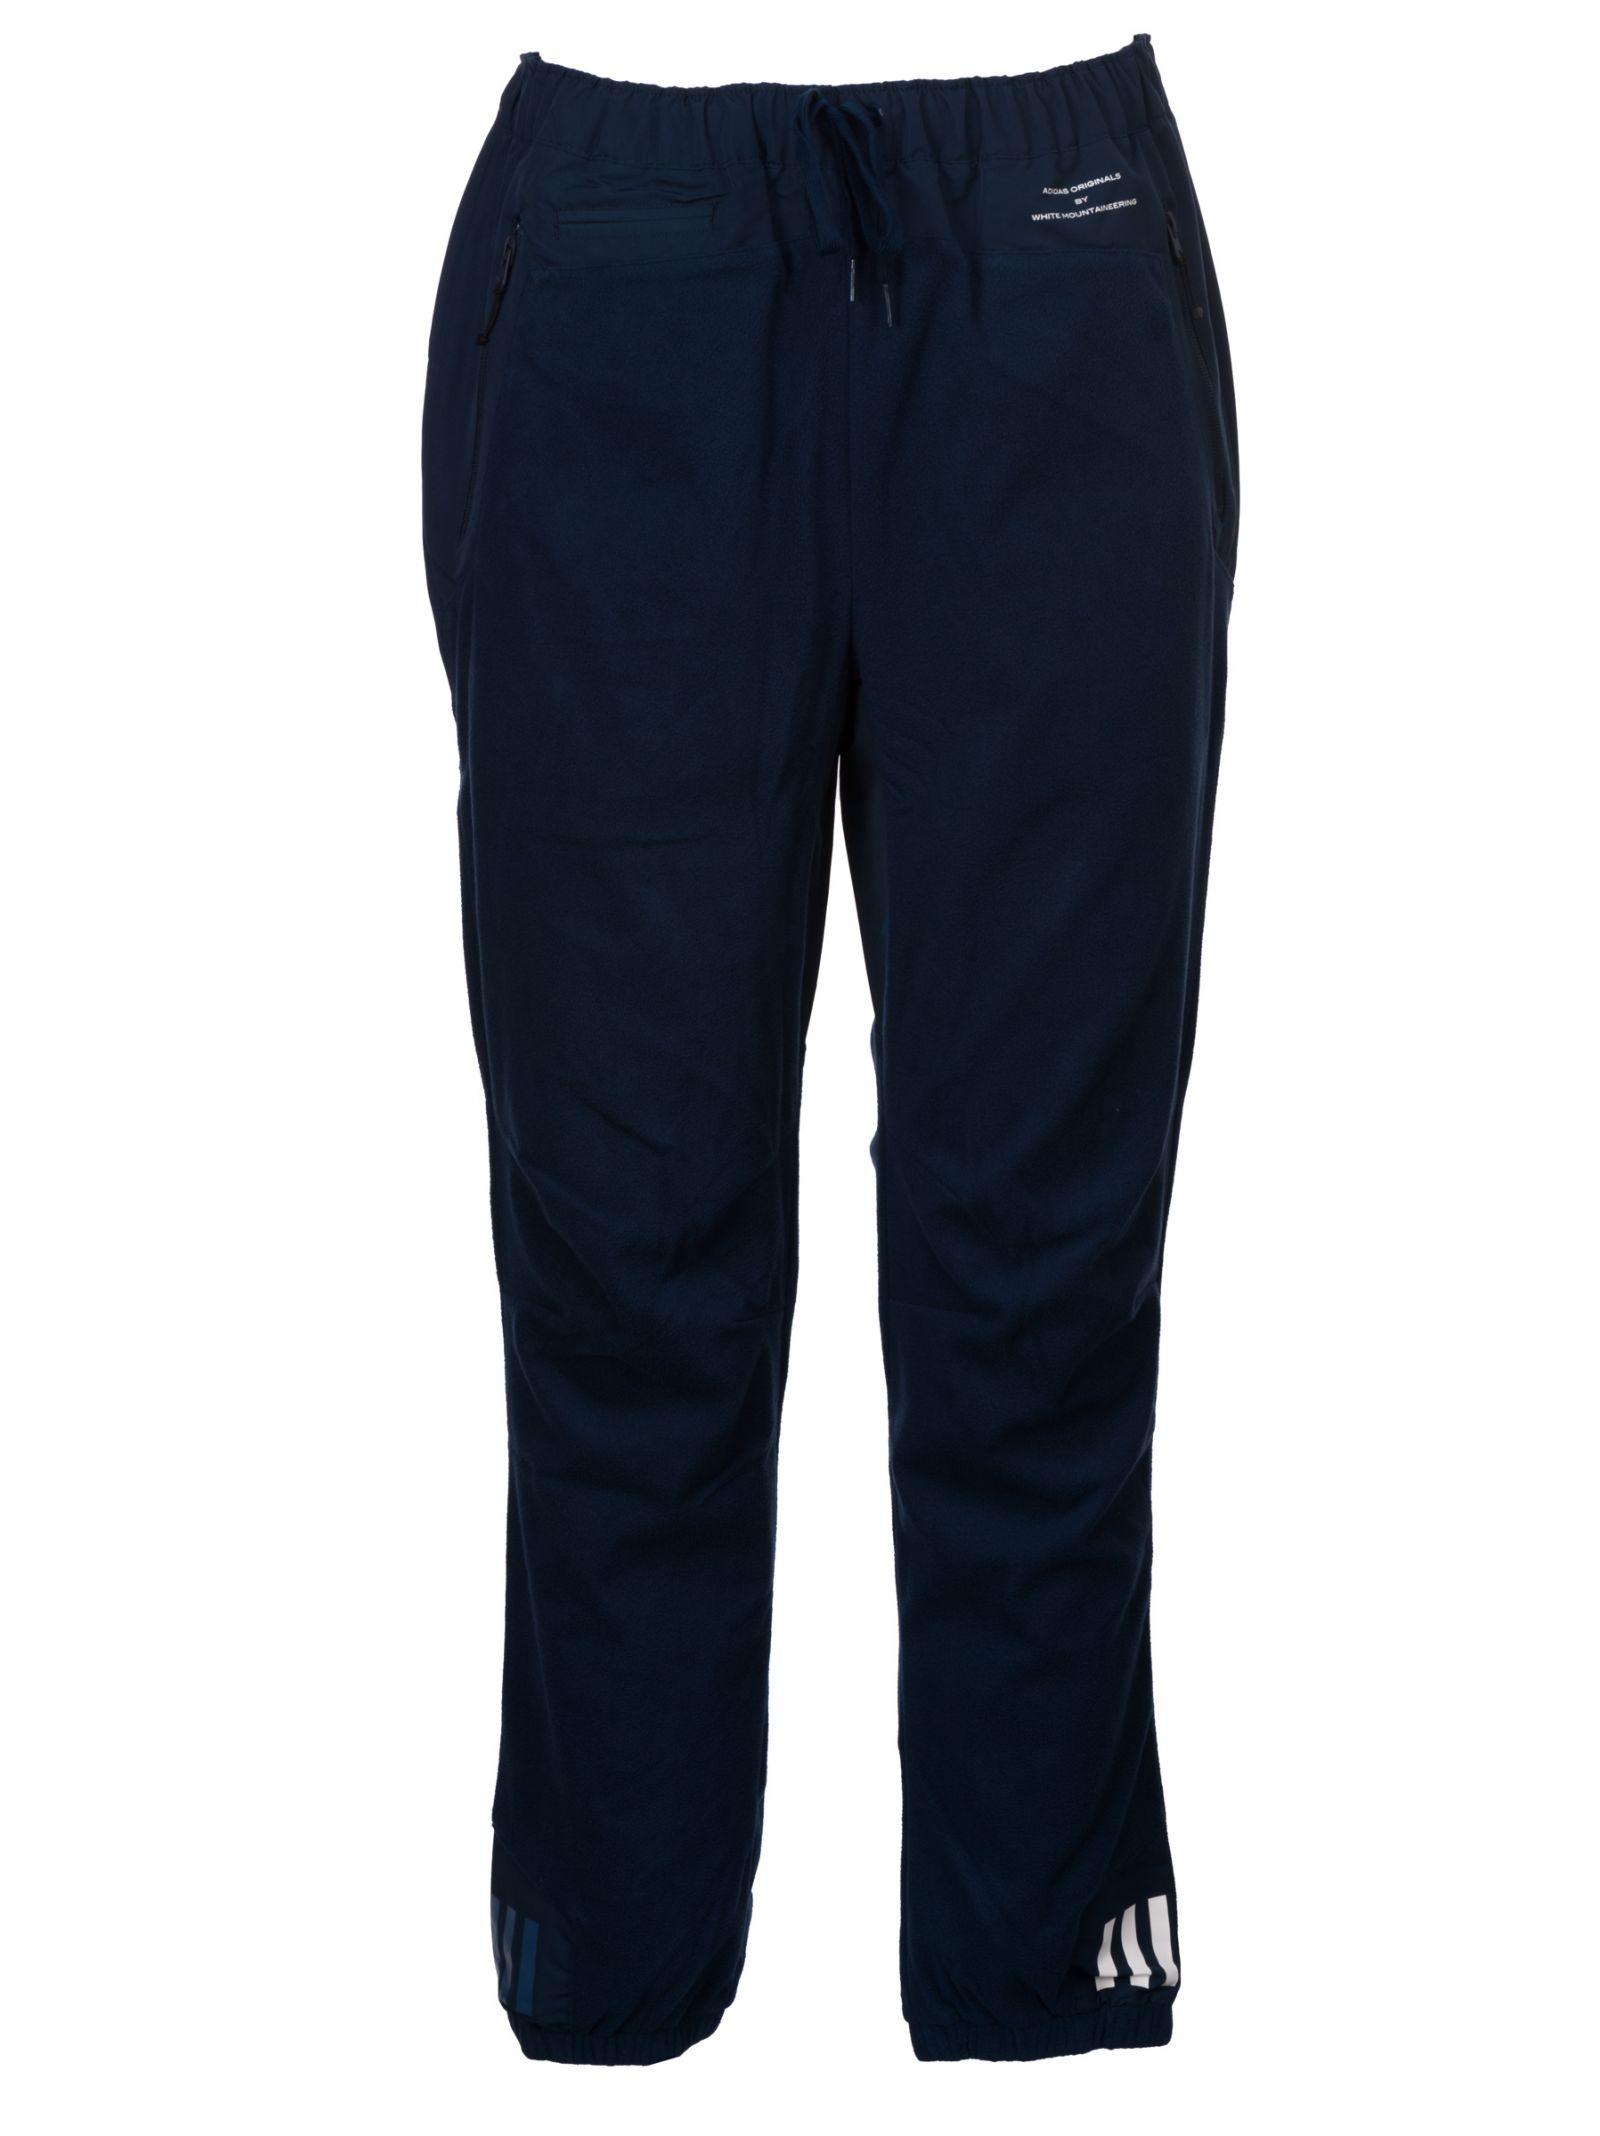 Adidas Originals X White Mountaineering Track Pants